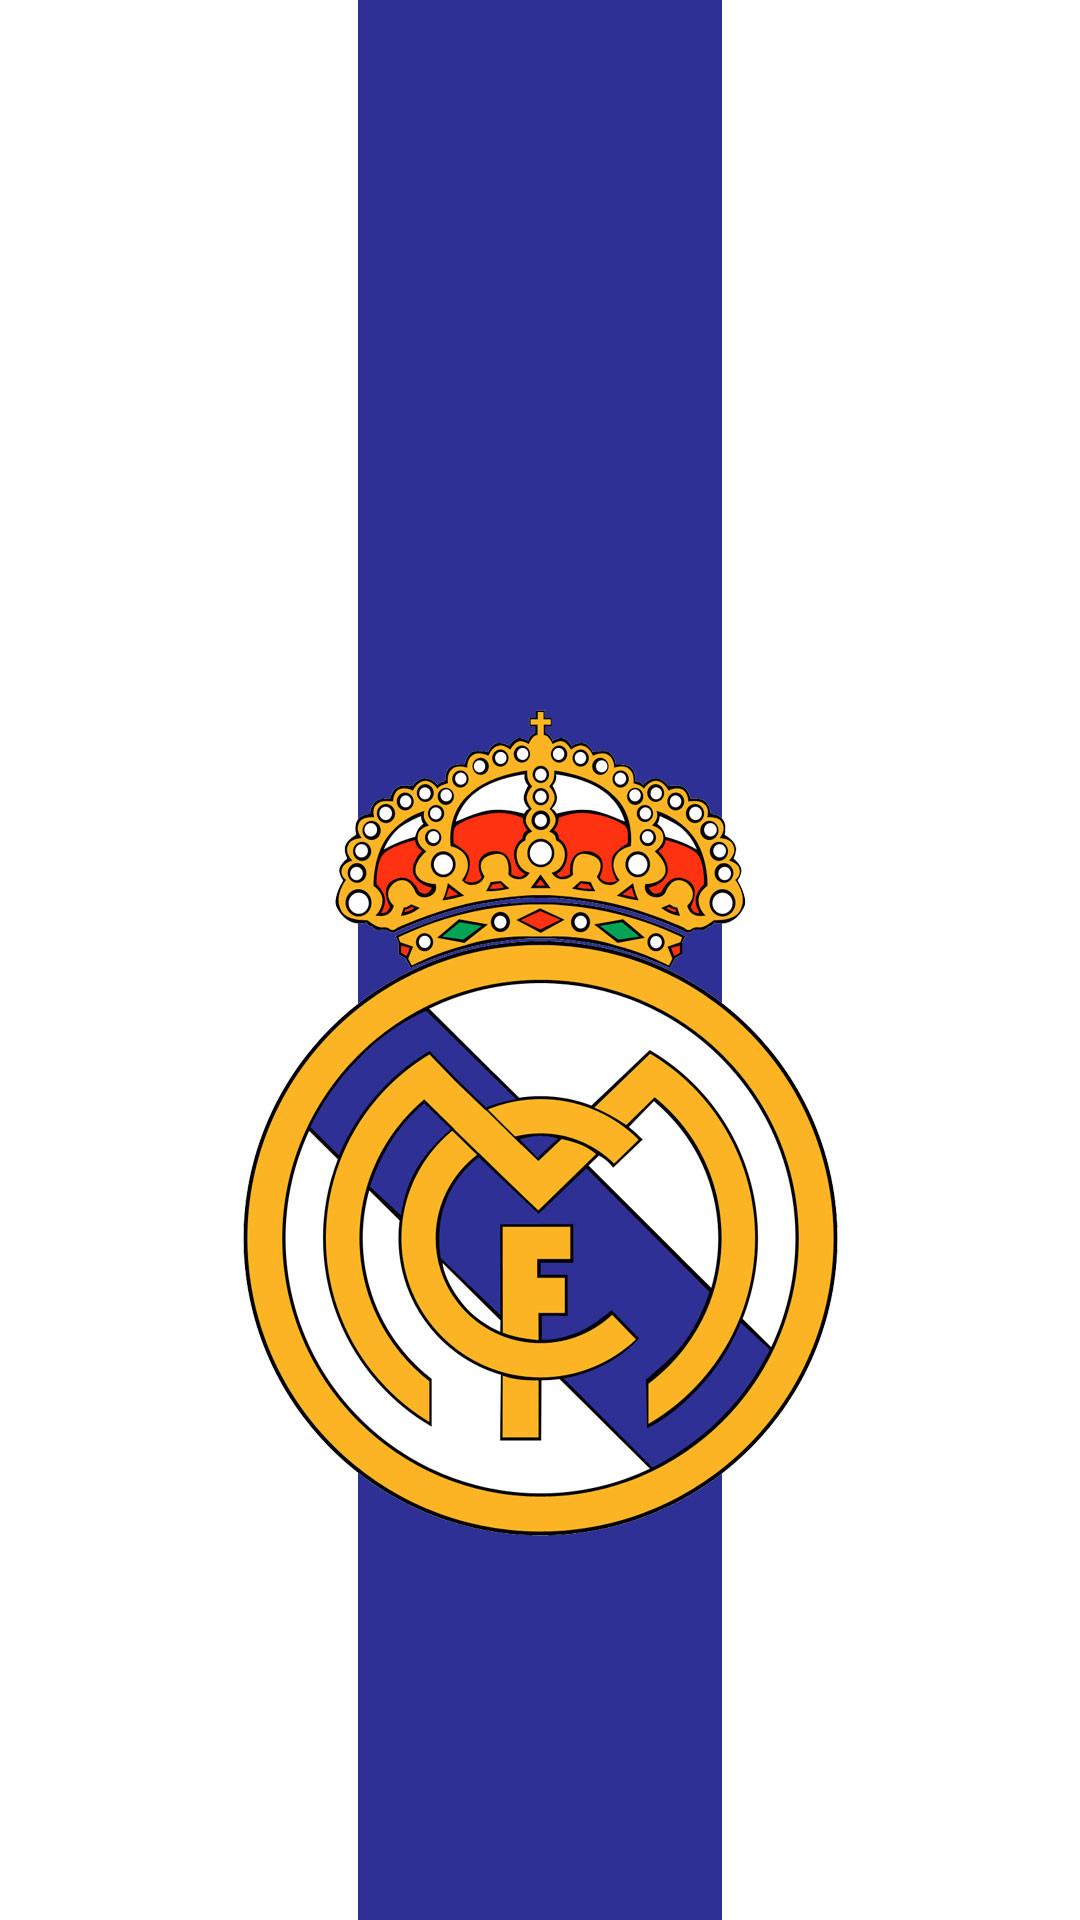 Res: 1080x1920, Real Madrid Lockscreen Wallpaper 1080 x 1920 ...